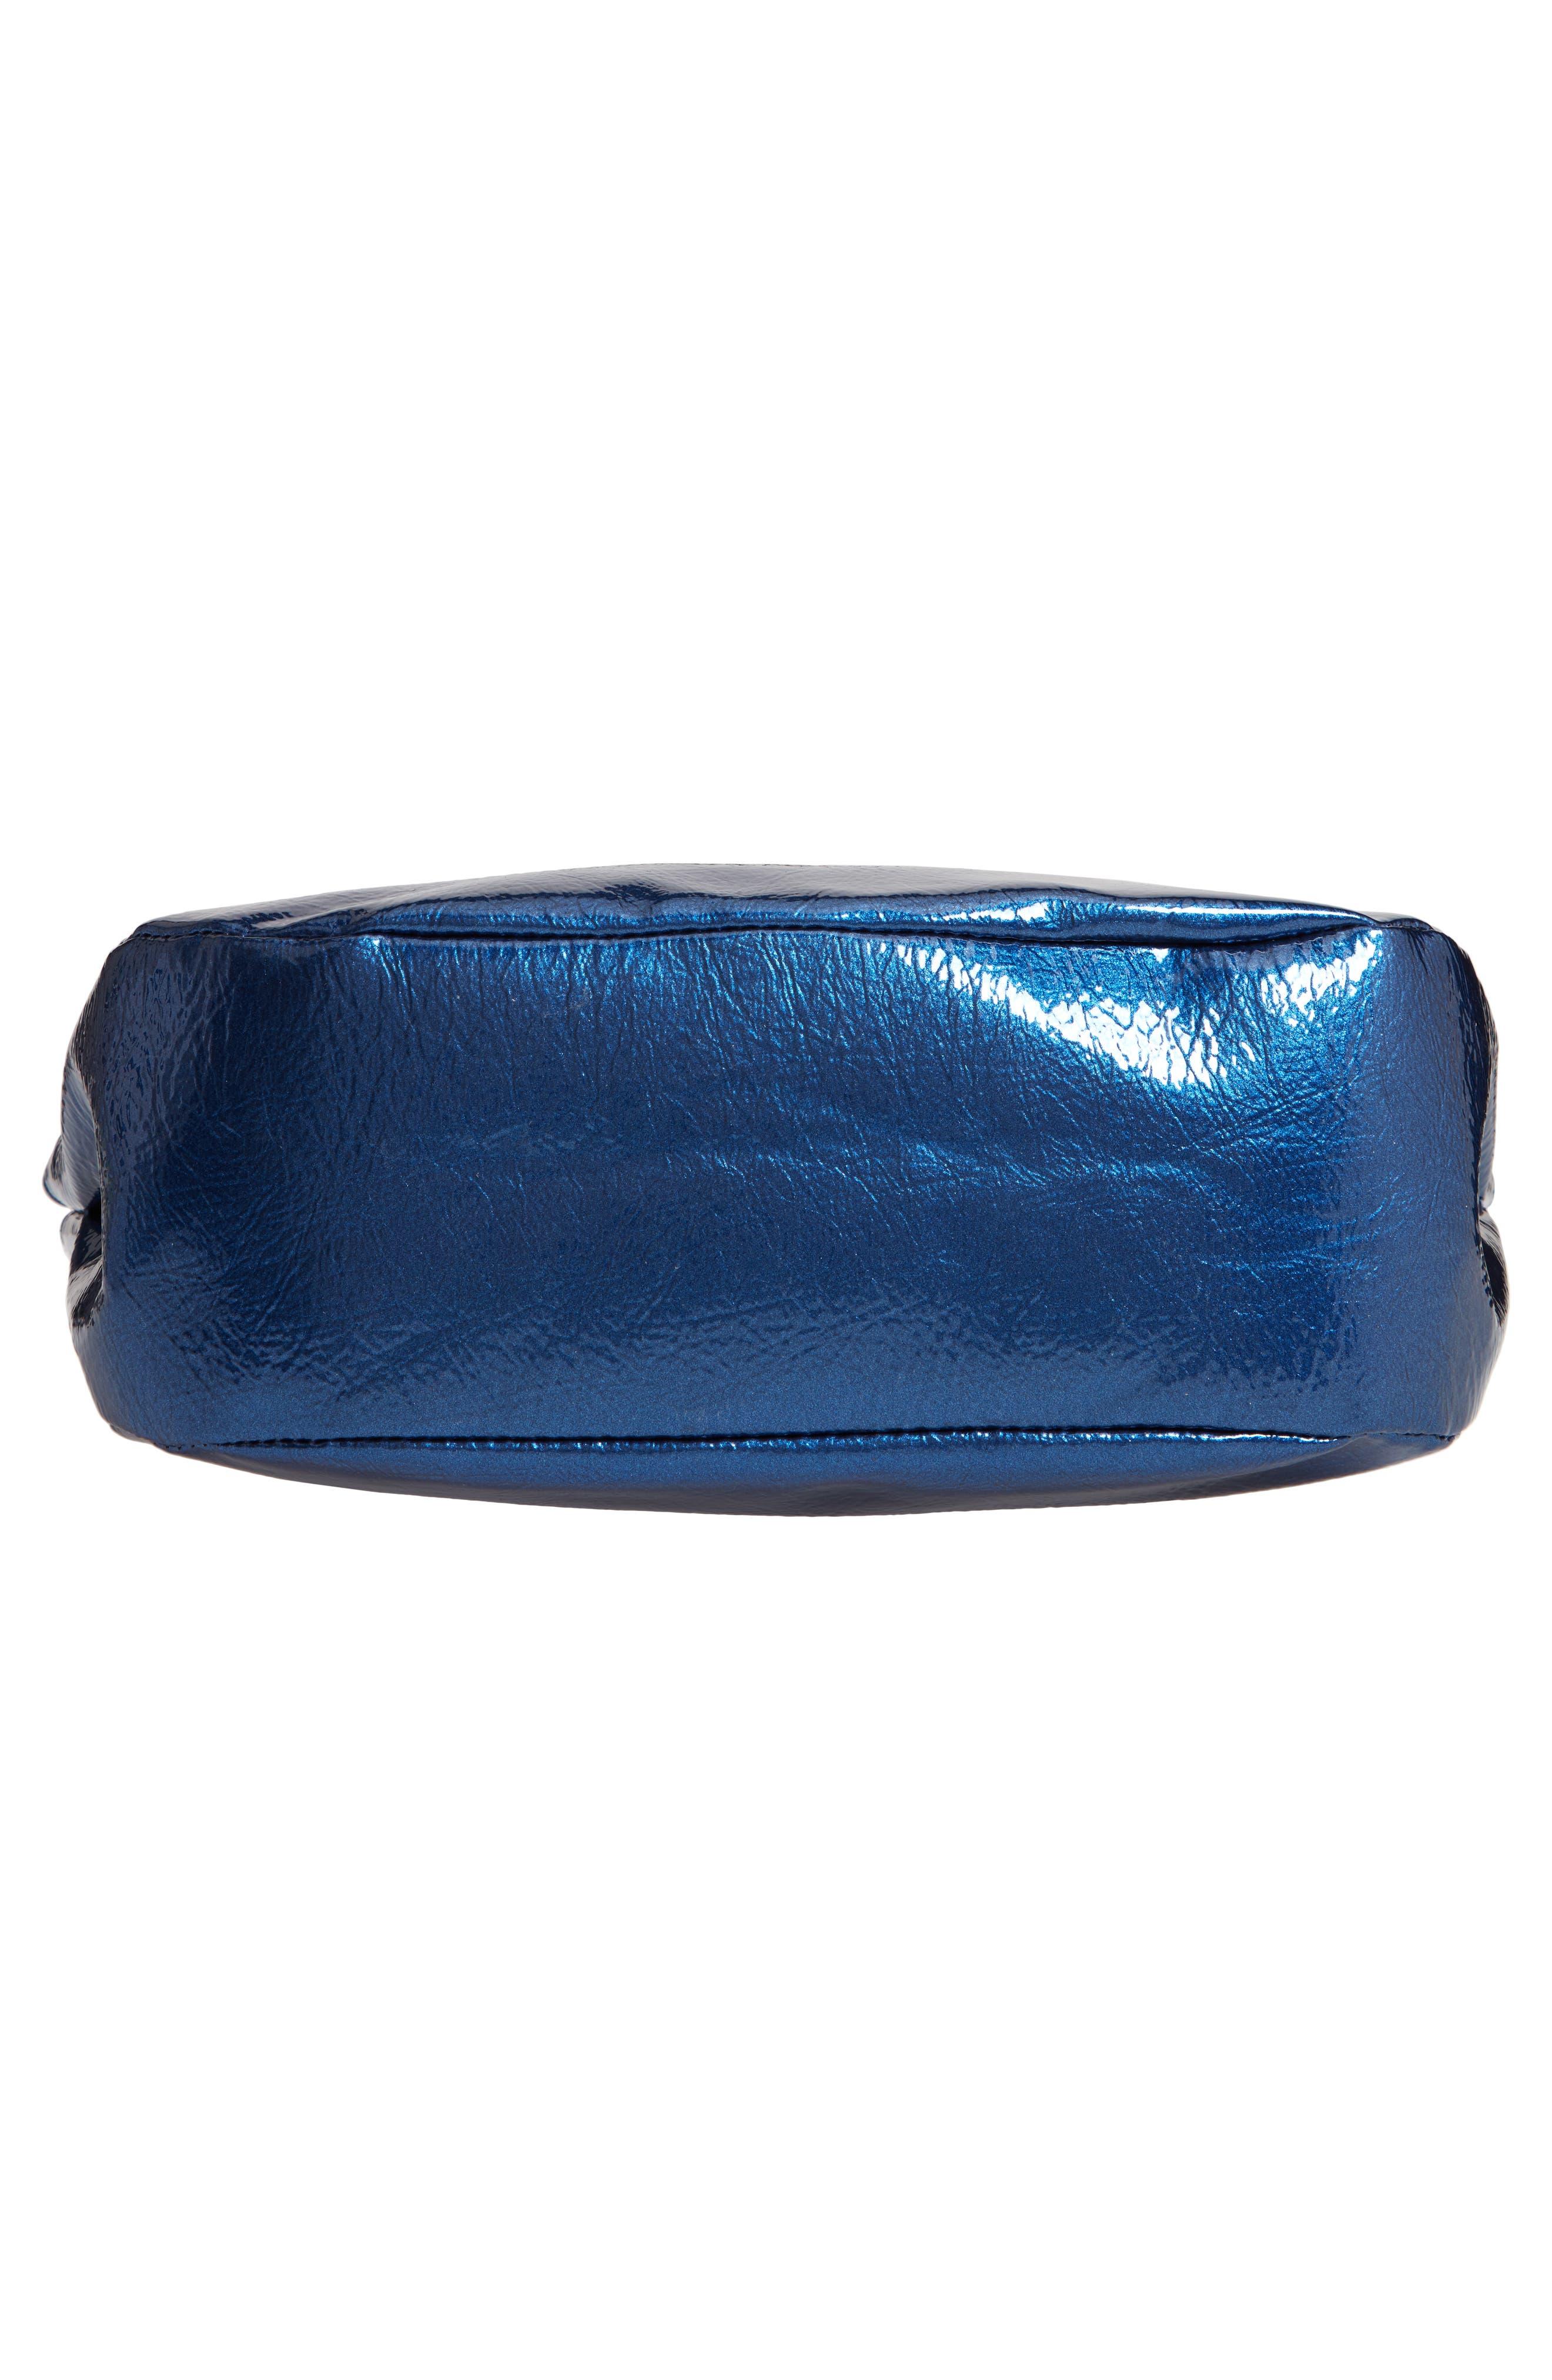 Patent Leather Crossbody Bag,                             Alternate thumbnail 6, color,                             400